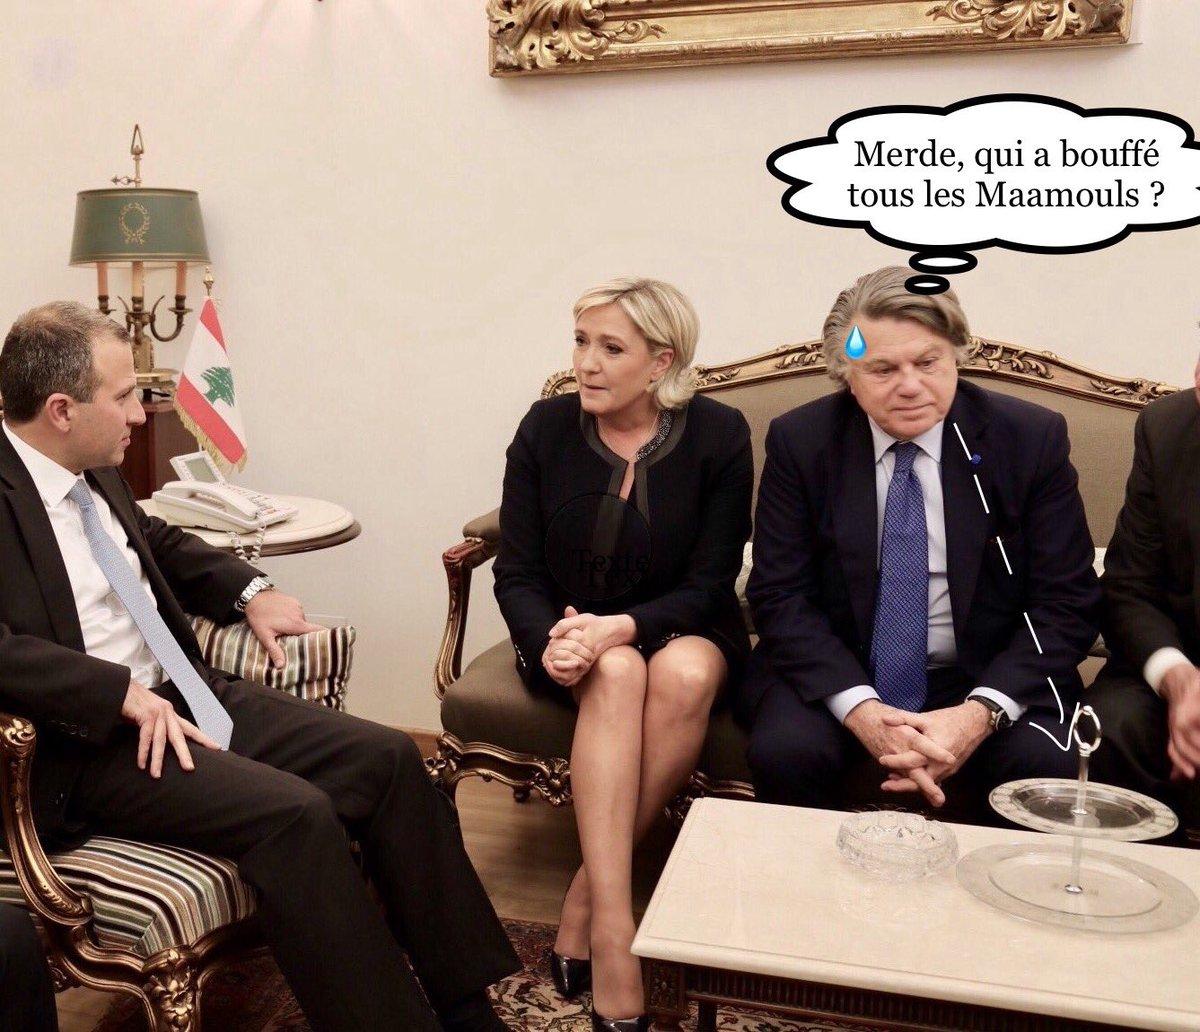 @GilbertCollard : &quot;Qui a bouffé tous les Maamouls ?...&quot; #Liban #FN #MLP #MLPLiban #Politique #Presidentielle2017 #LePen @MLP_officiel<br>http://pic.twitter.com/37nBF9BFai